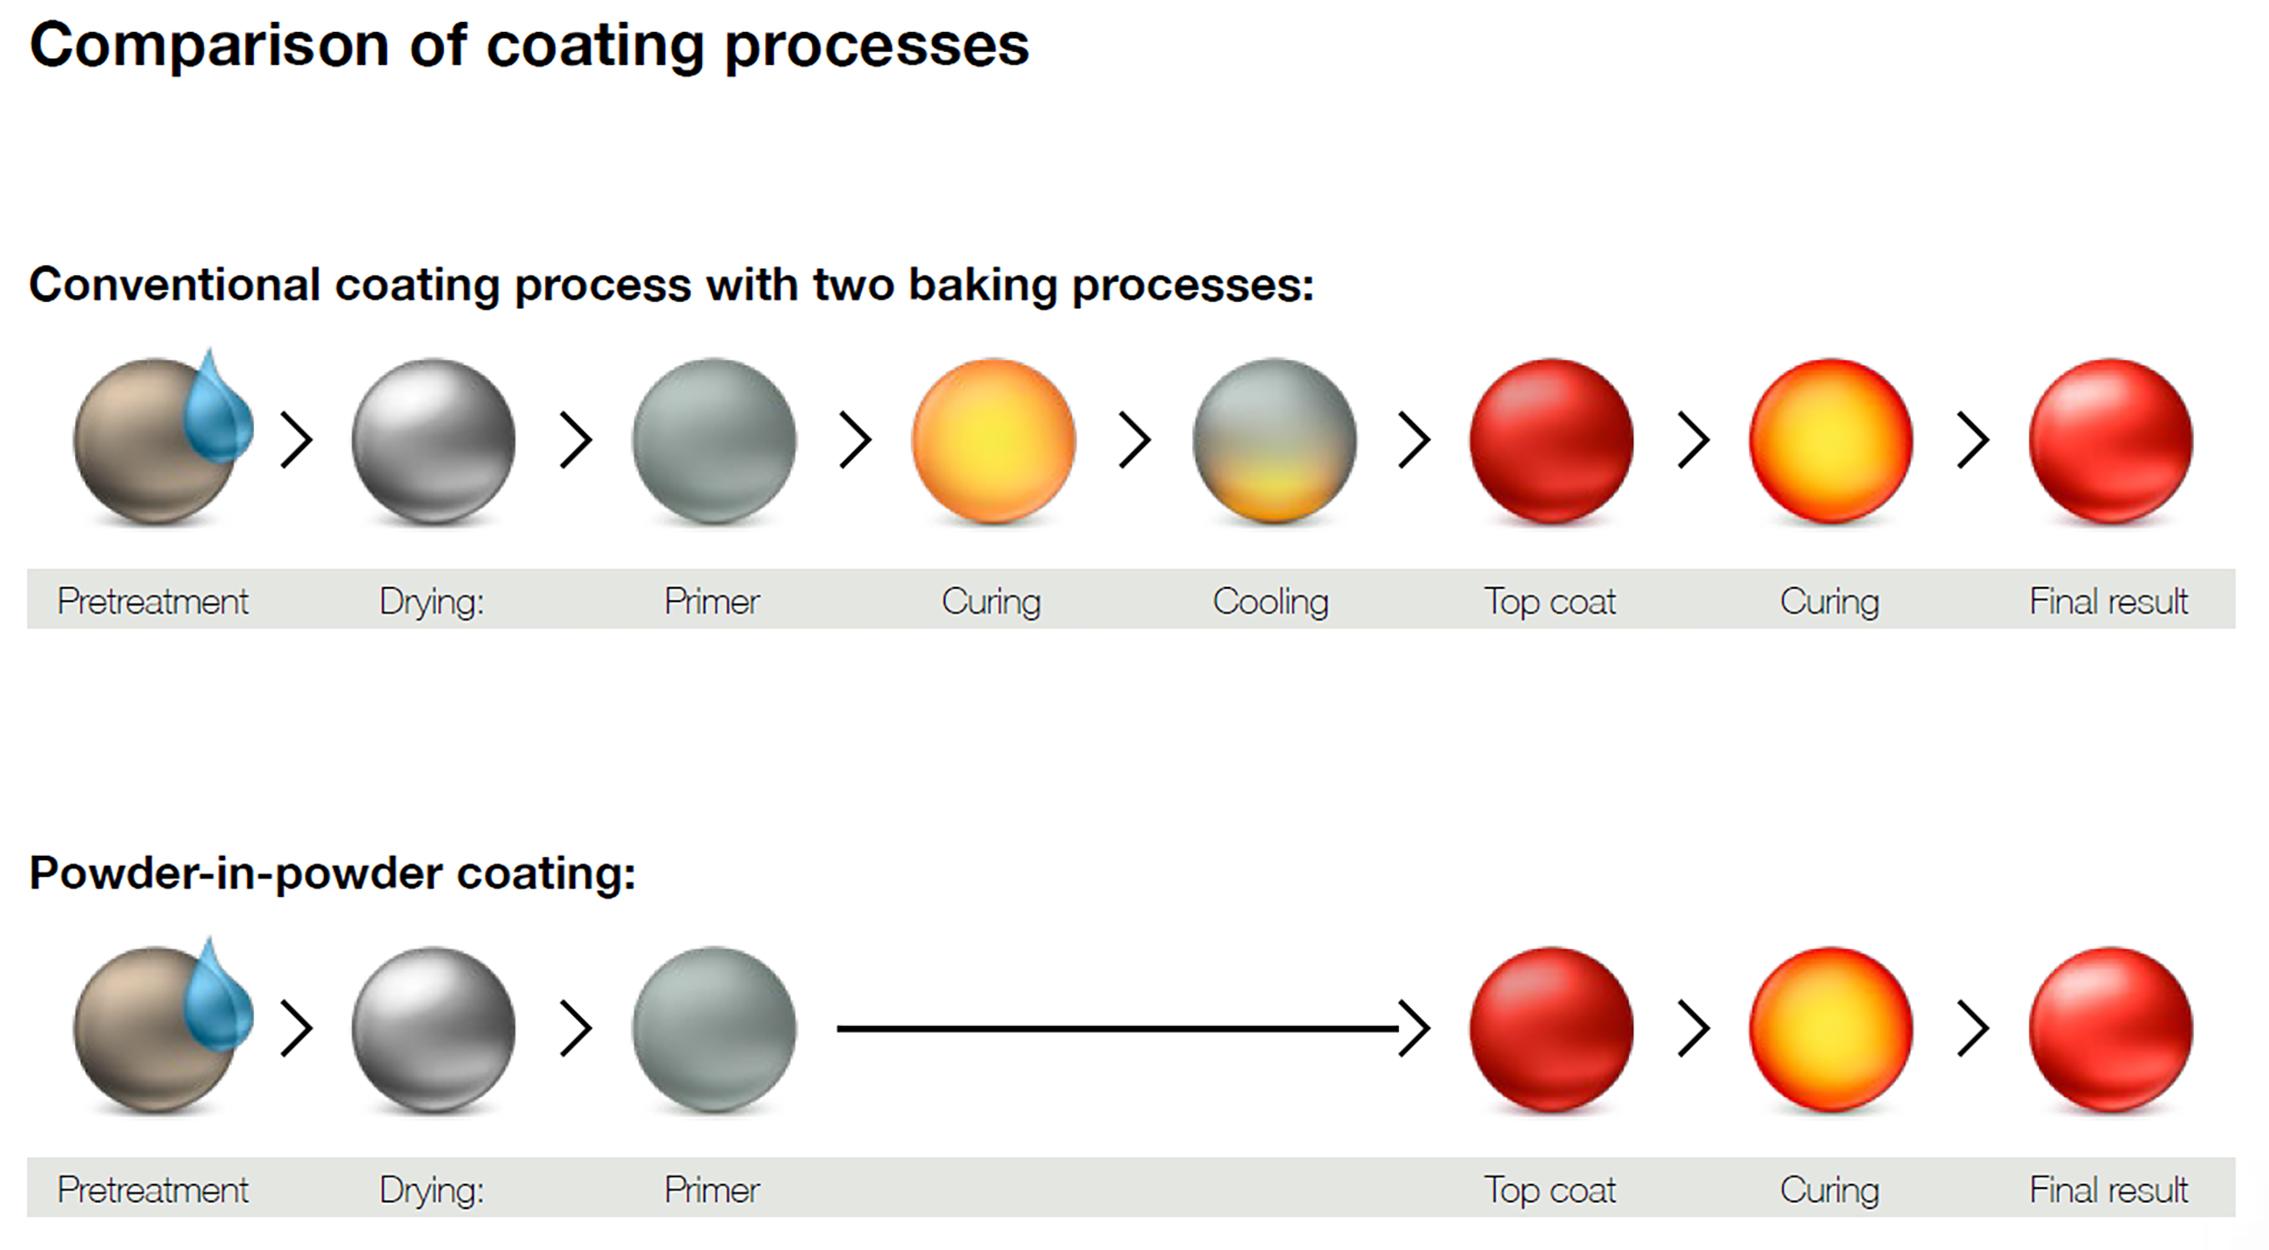 Powder-in-Powder coating process